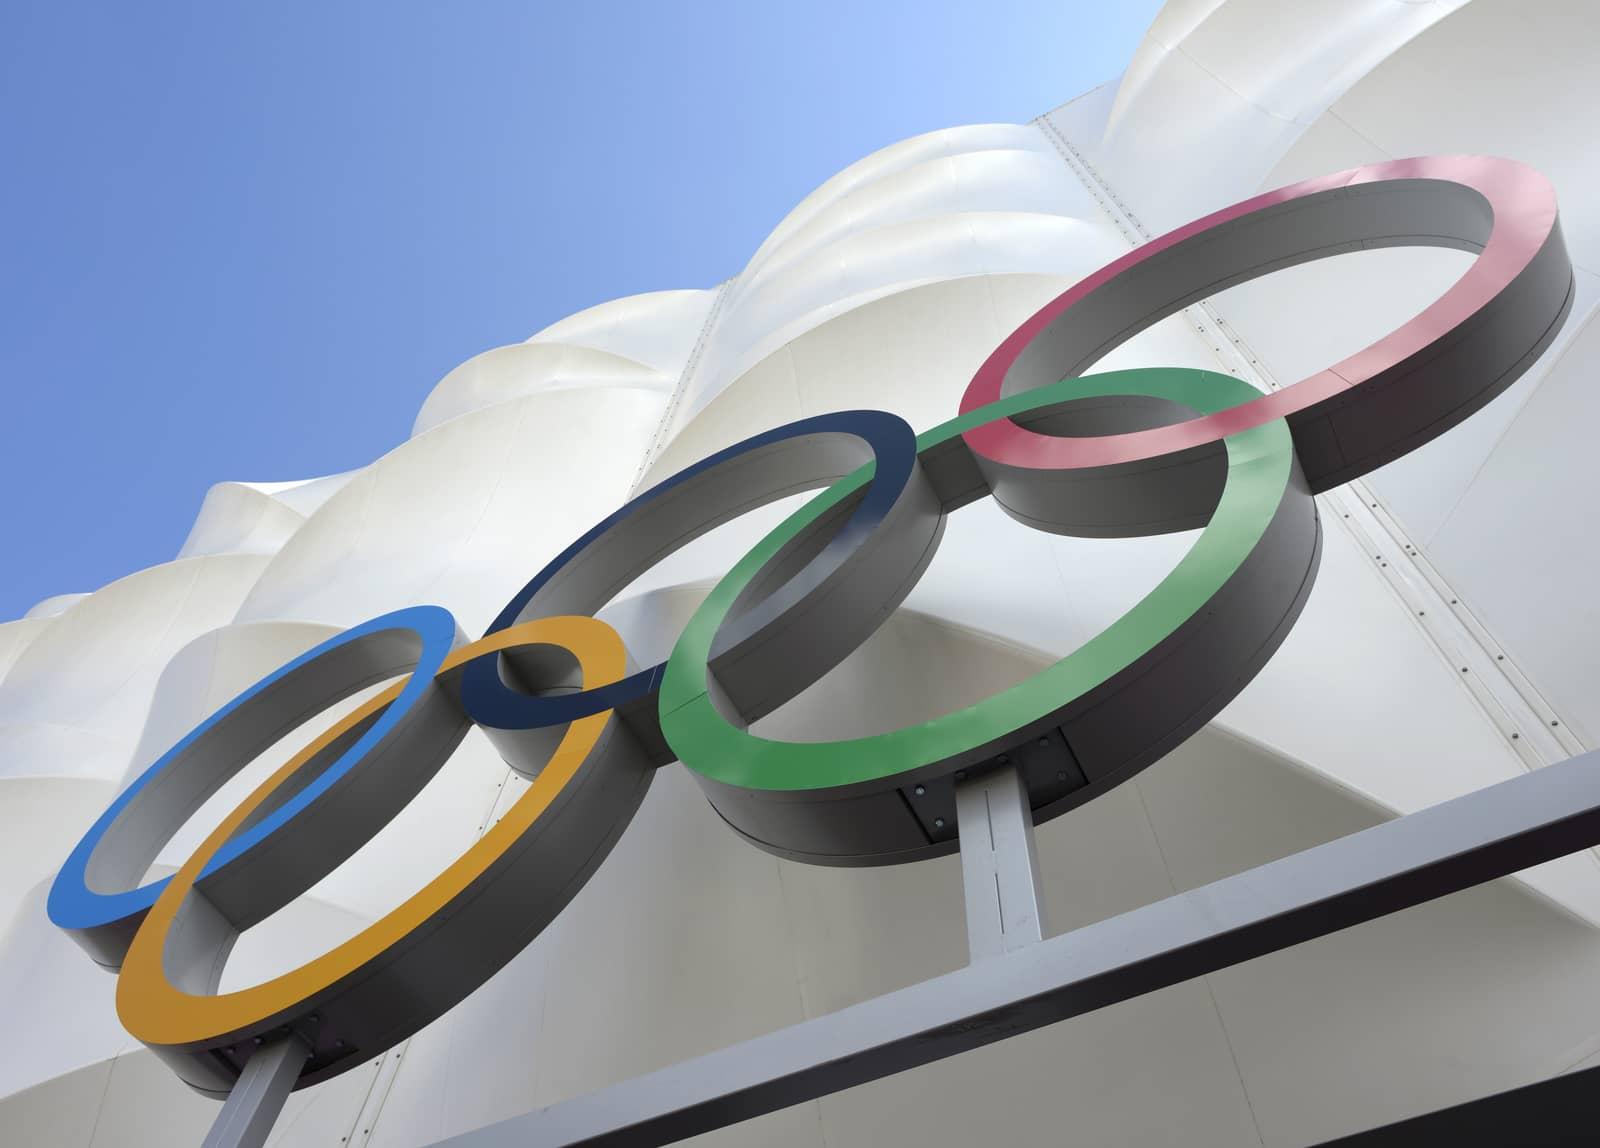 London 2012 Olympic Rings